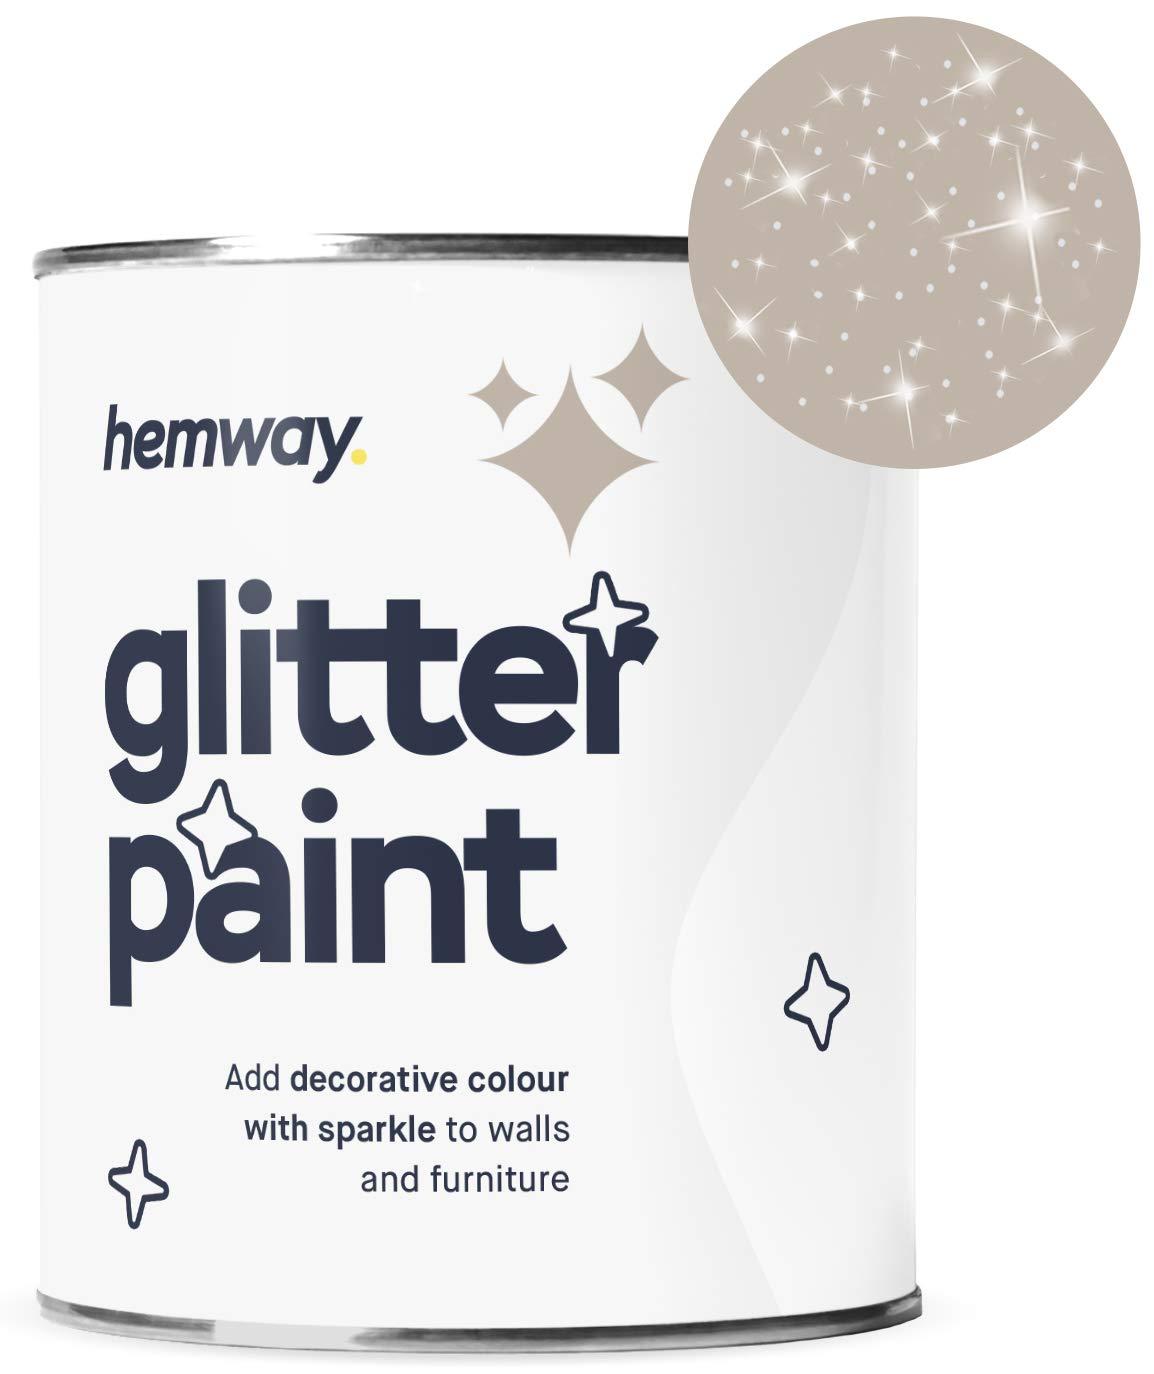 Hemway Silver Glitter Paint 1L Matte Walls Wallpaper Bathroom Furniture Acrylic Latex (Latte Brown)